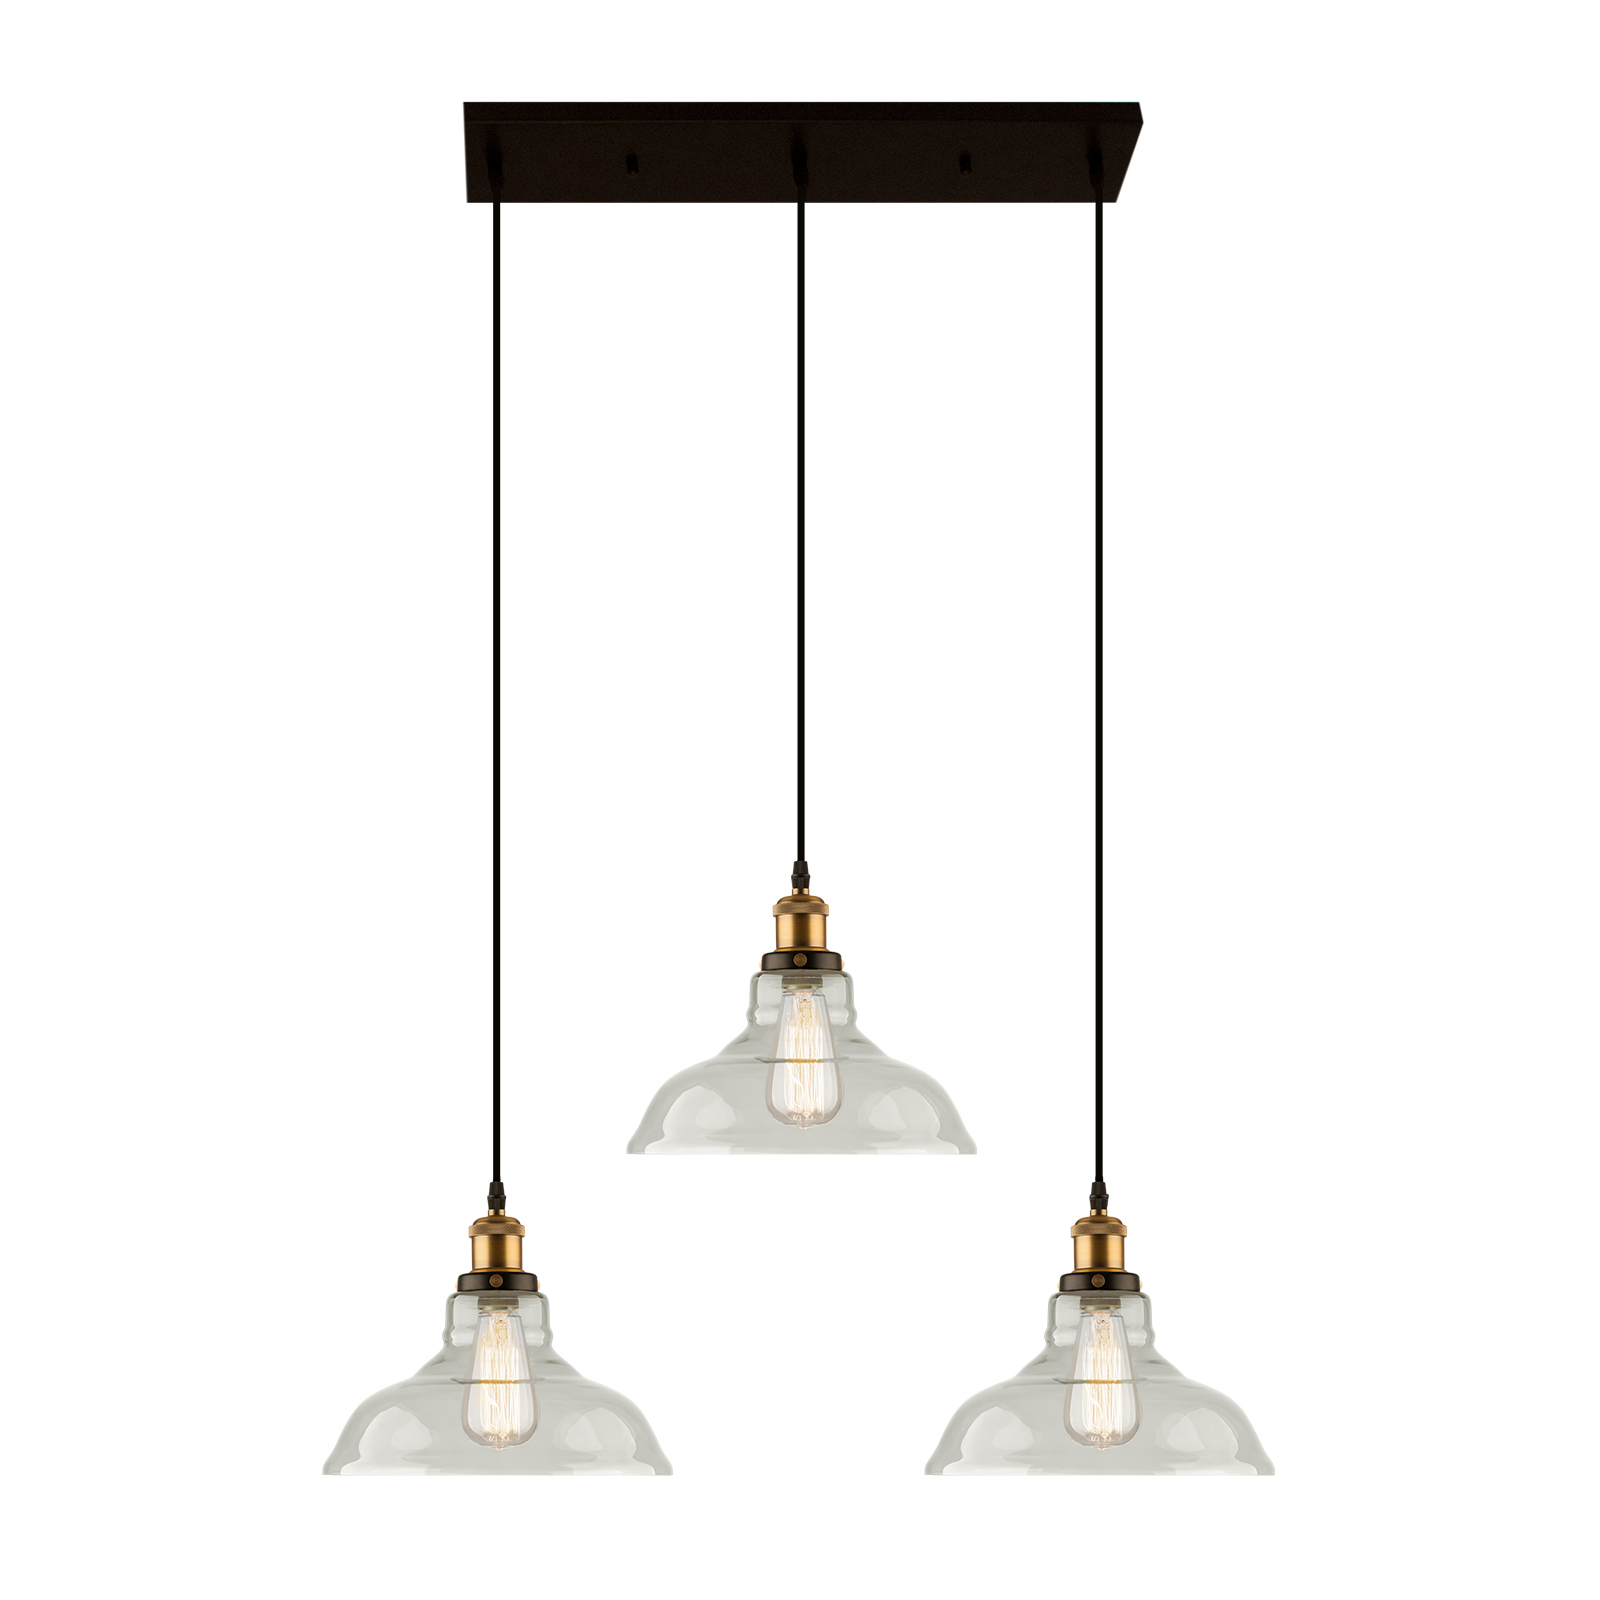 Suspension LA040 E27 3 lampes laiton/transparente